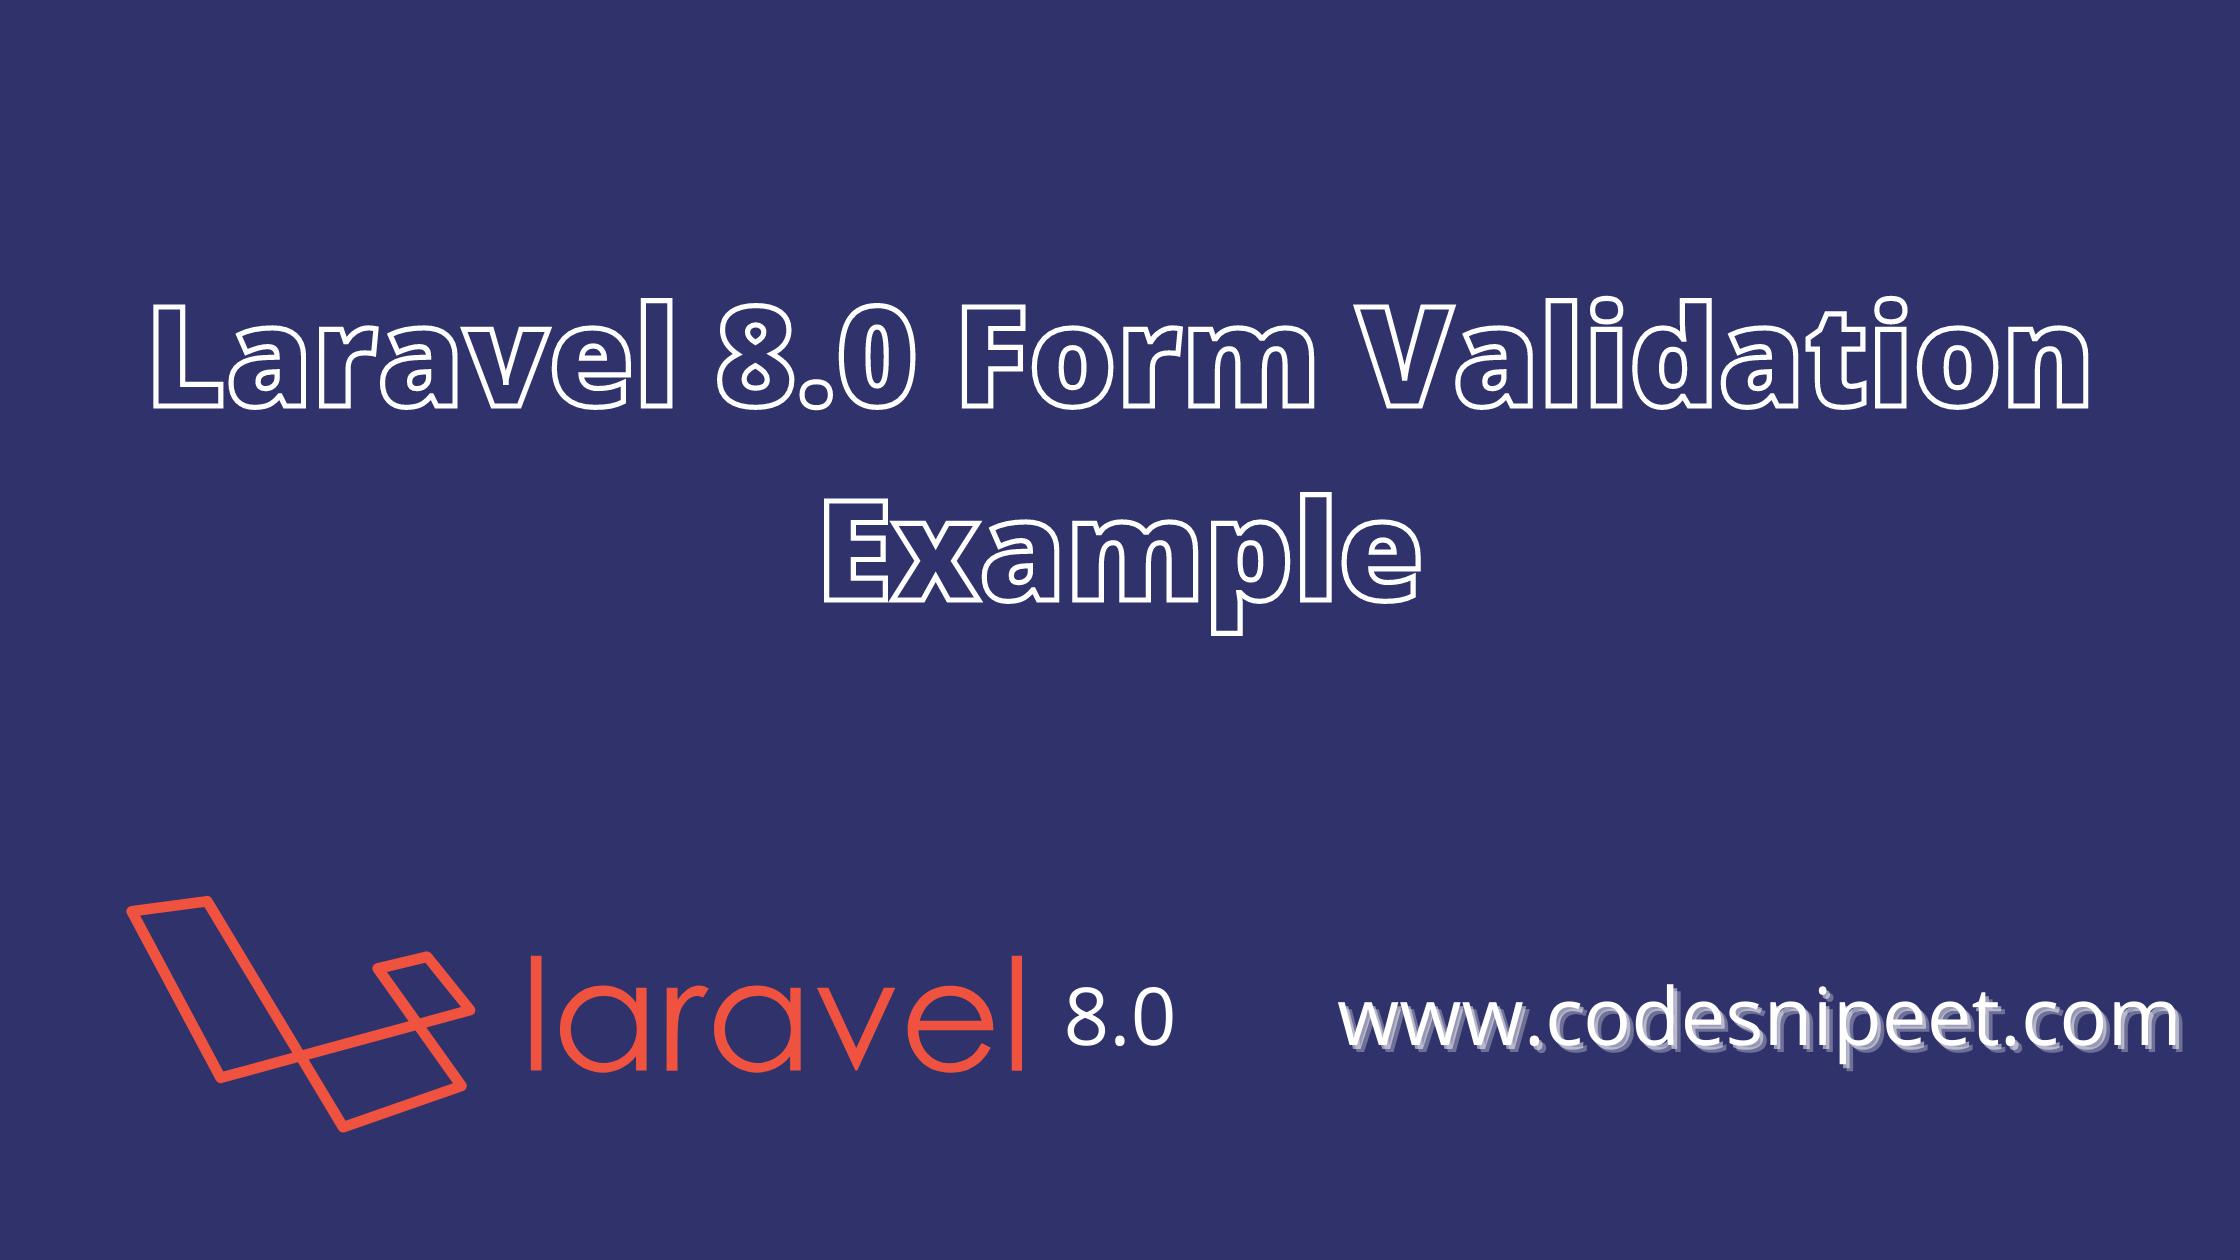 Laravel 8.0 Form Validation Example | Laravel